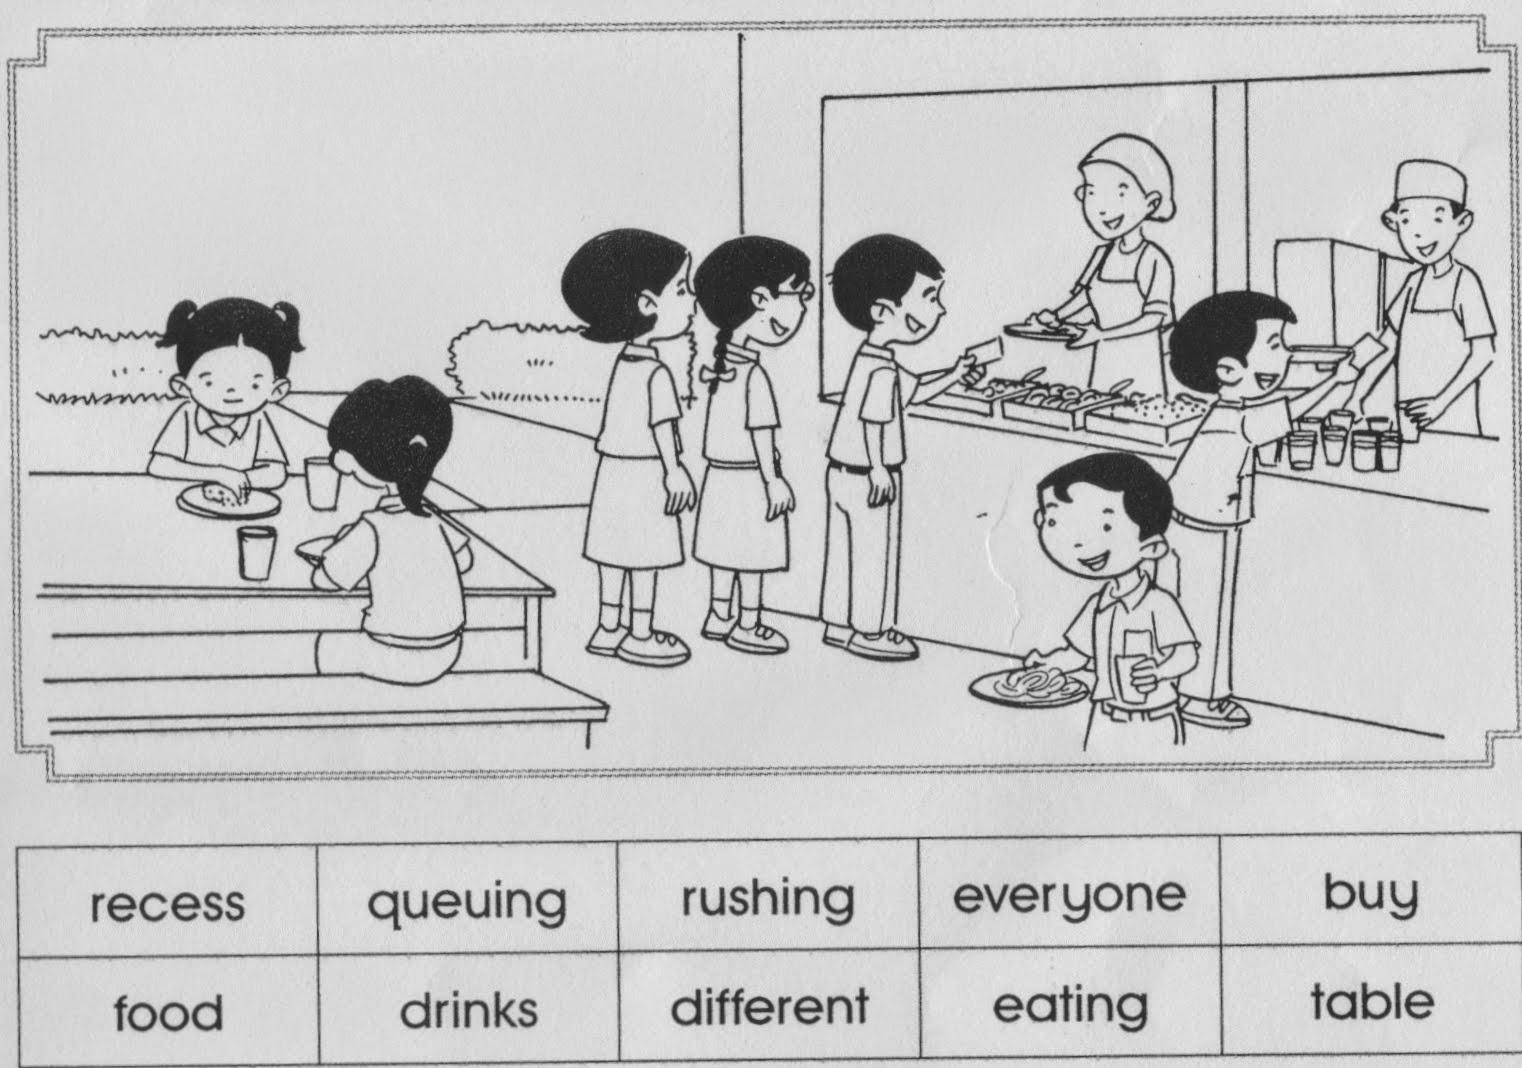 ( Recess time at Marina's school)